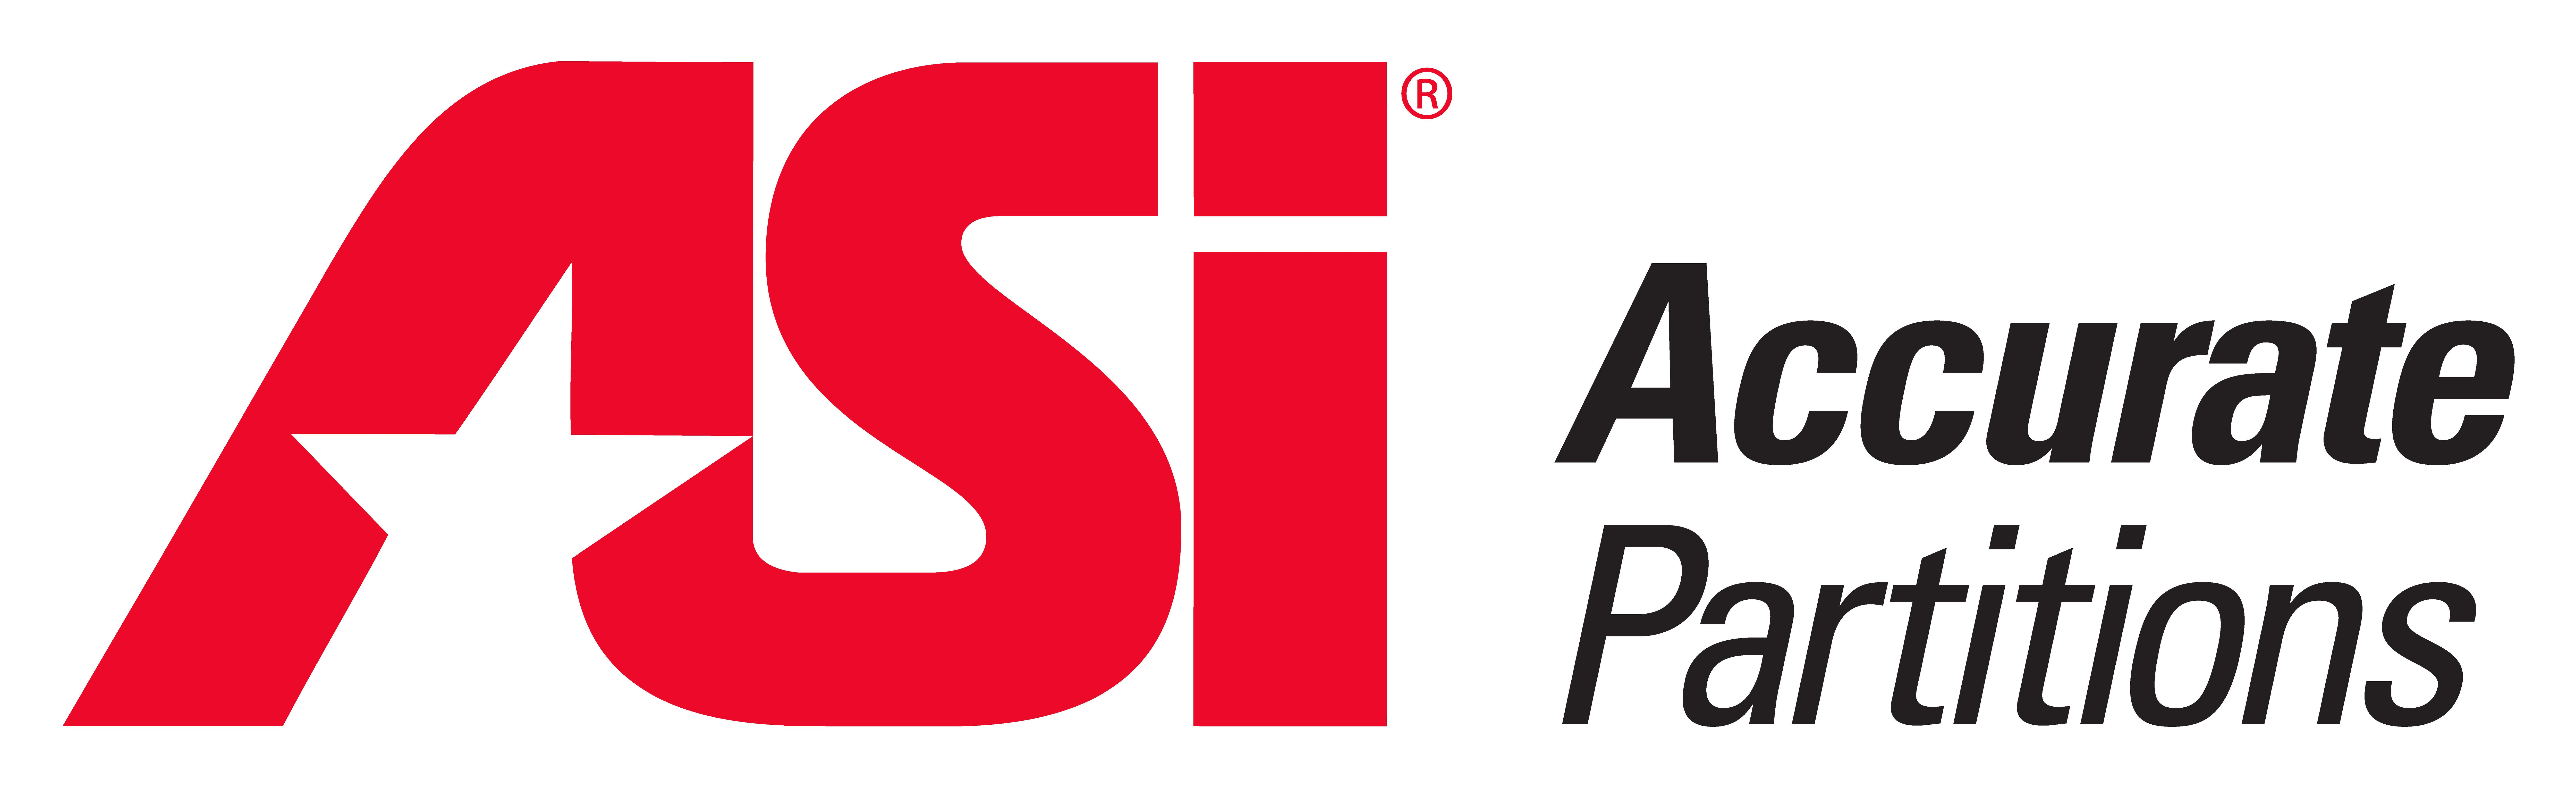 ASI_Accurate Partitions Brandmark